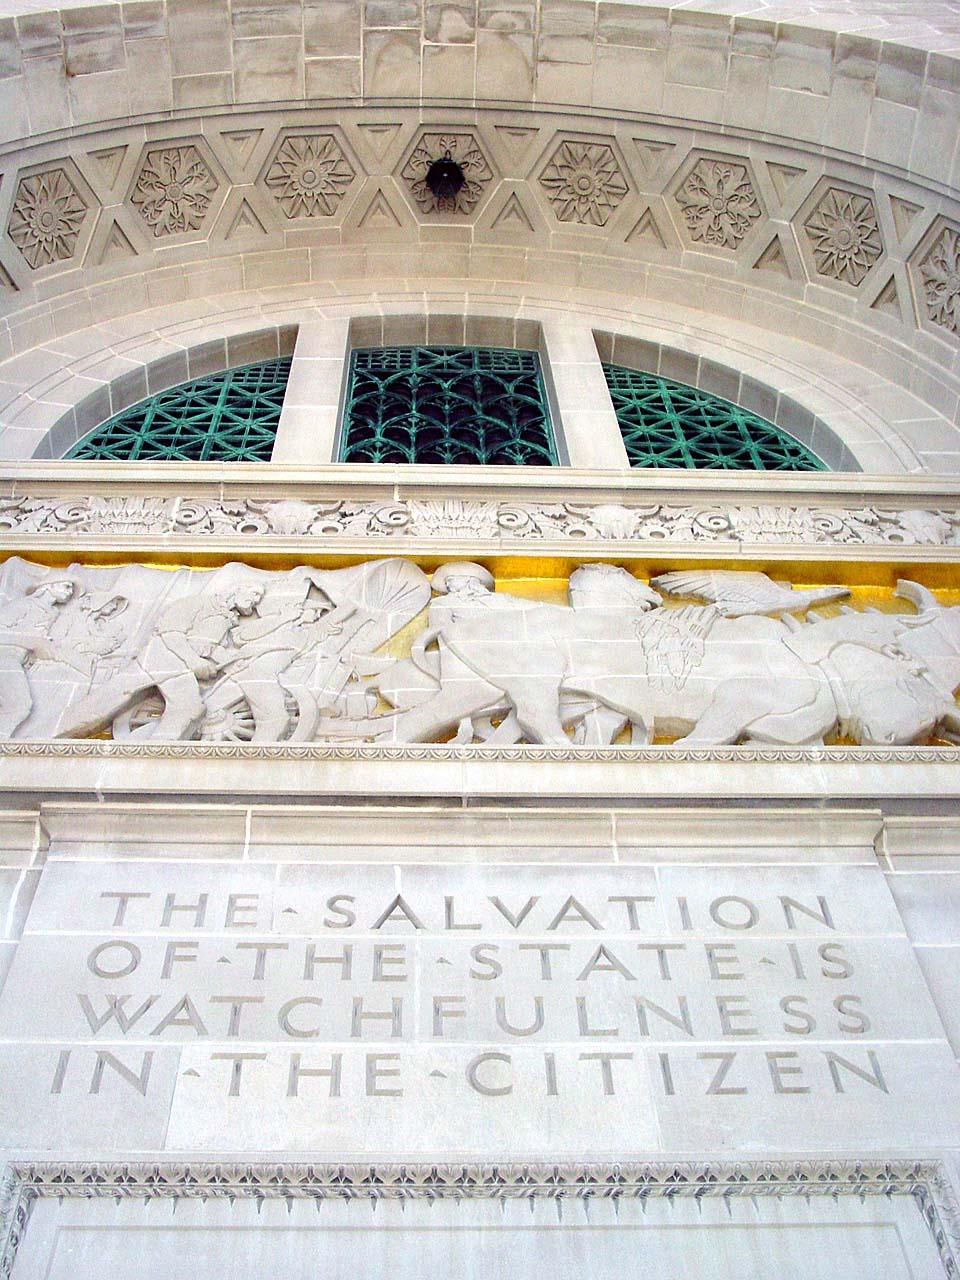 Watchfulness In The Citizen